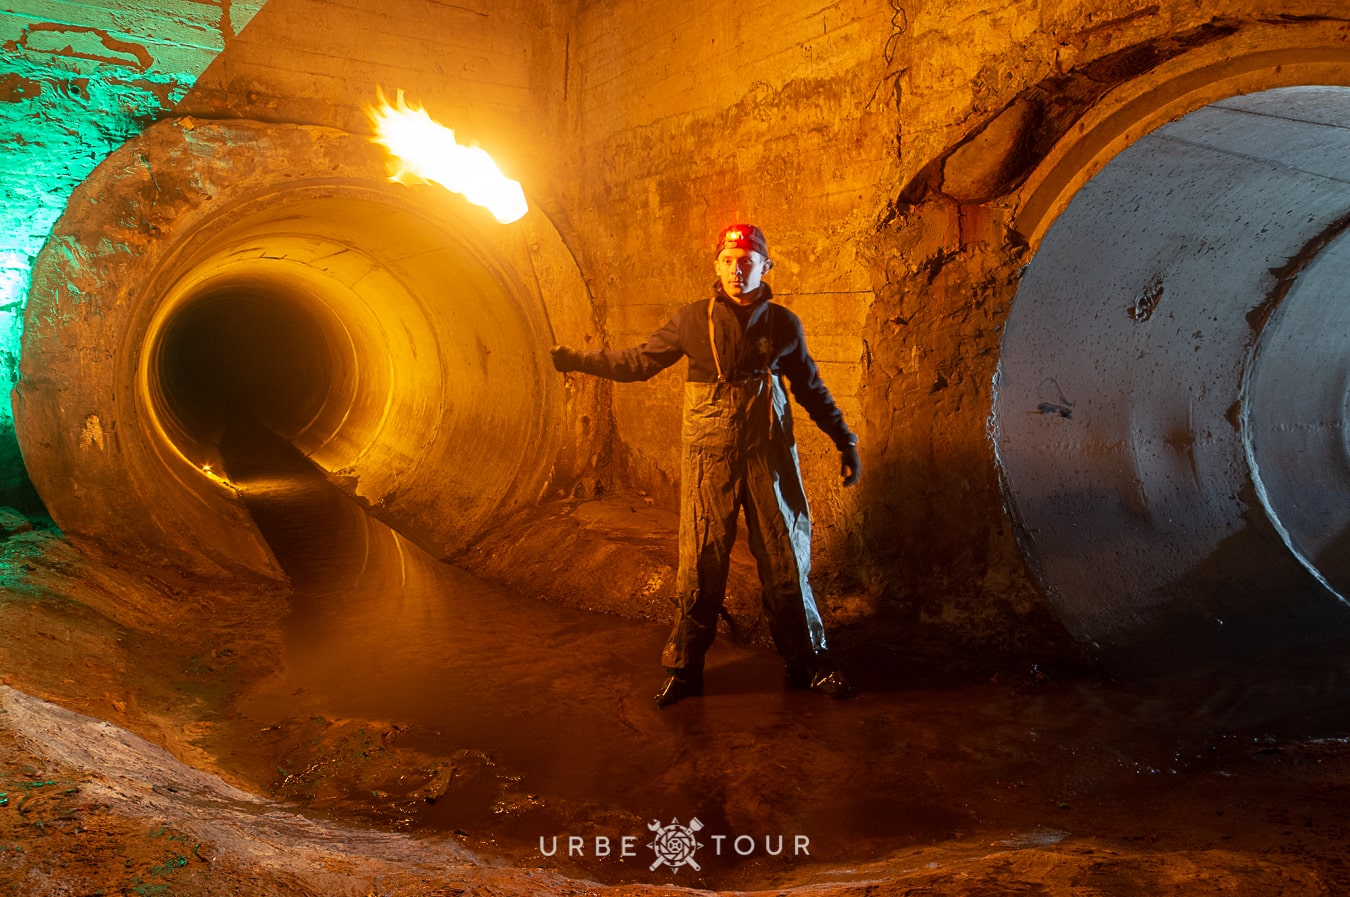 skomoroh-underground-river20 Подземная река Скоморох - 2020.01.12 16:00